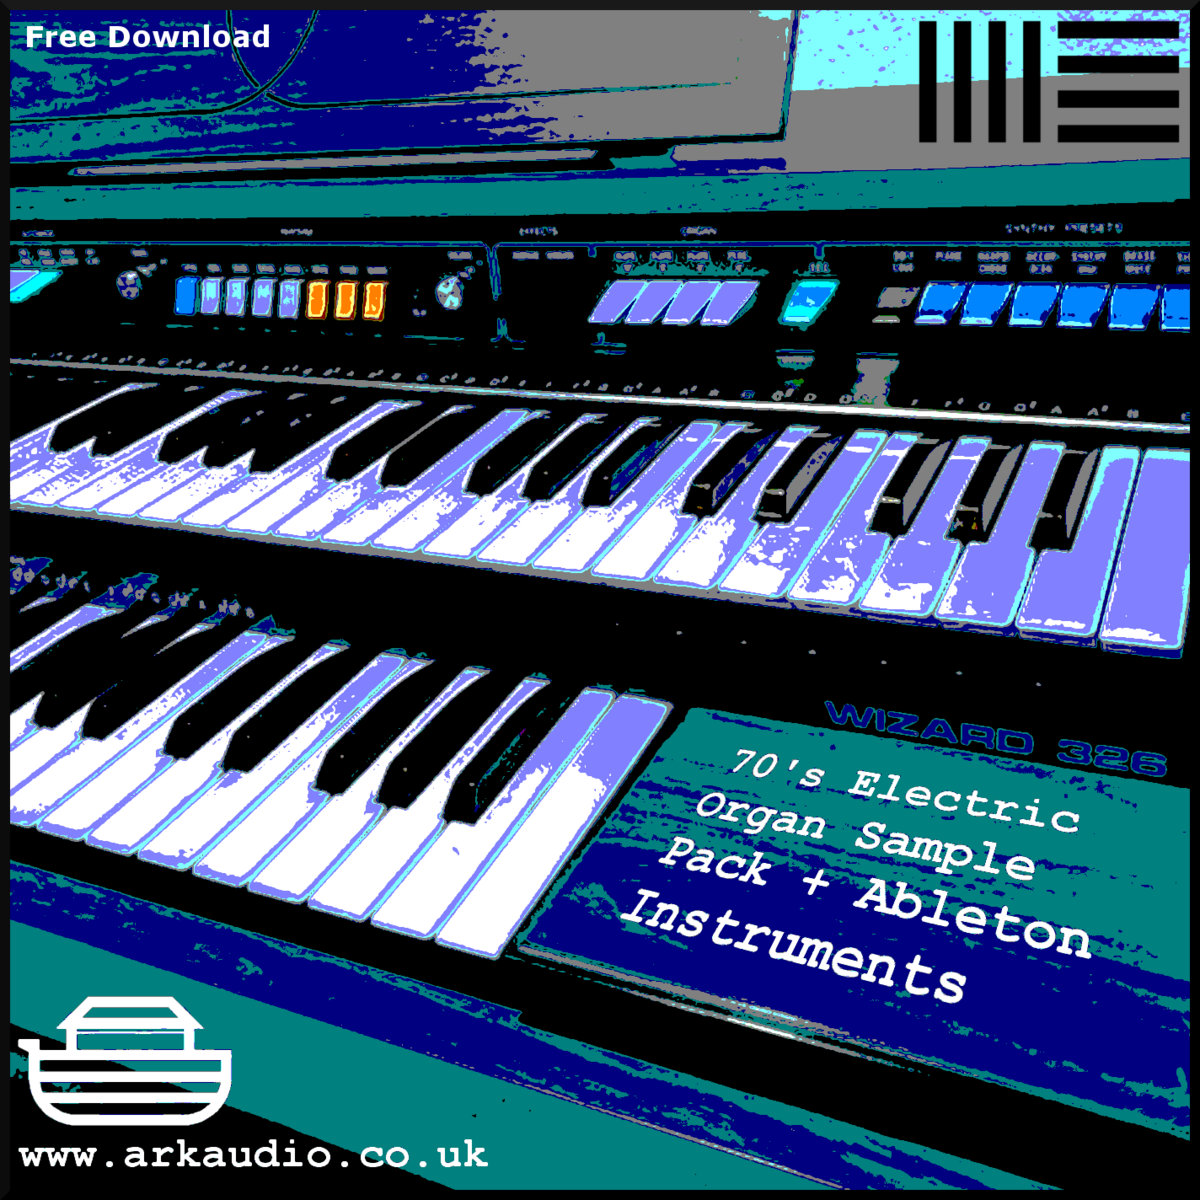 Vintage Electric Organ Samples [free] | Ark Records